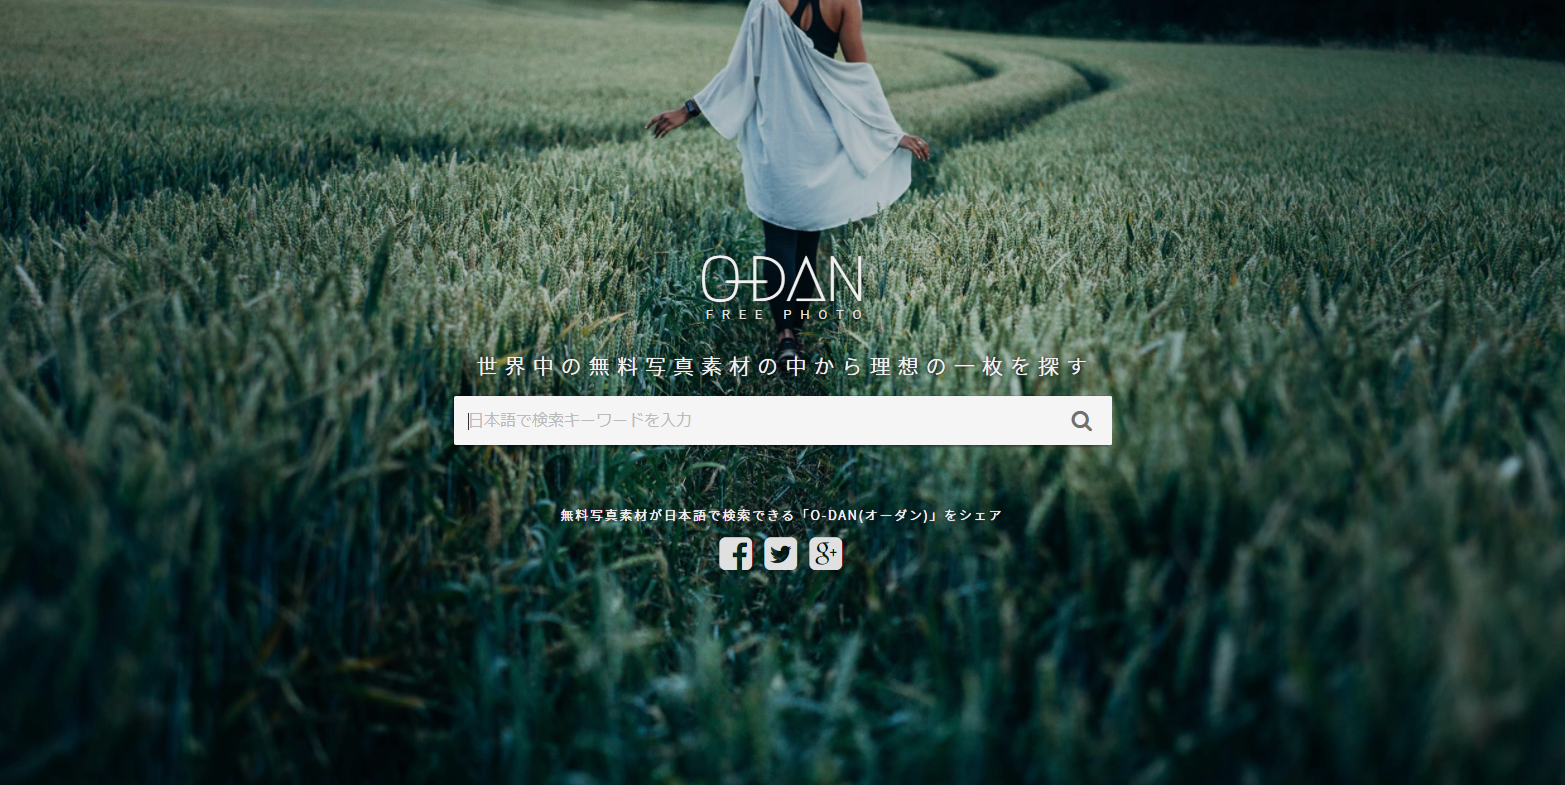 「O-DAN」複数のフリー写真素材サイトをまとめて検索できる